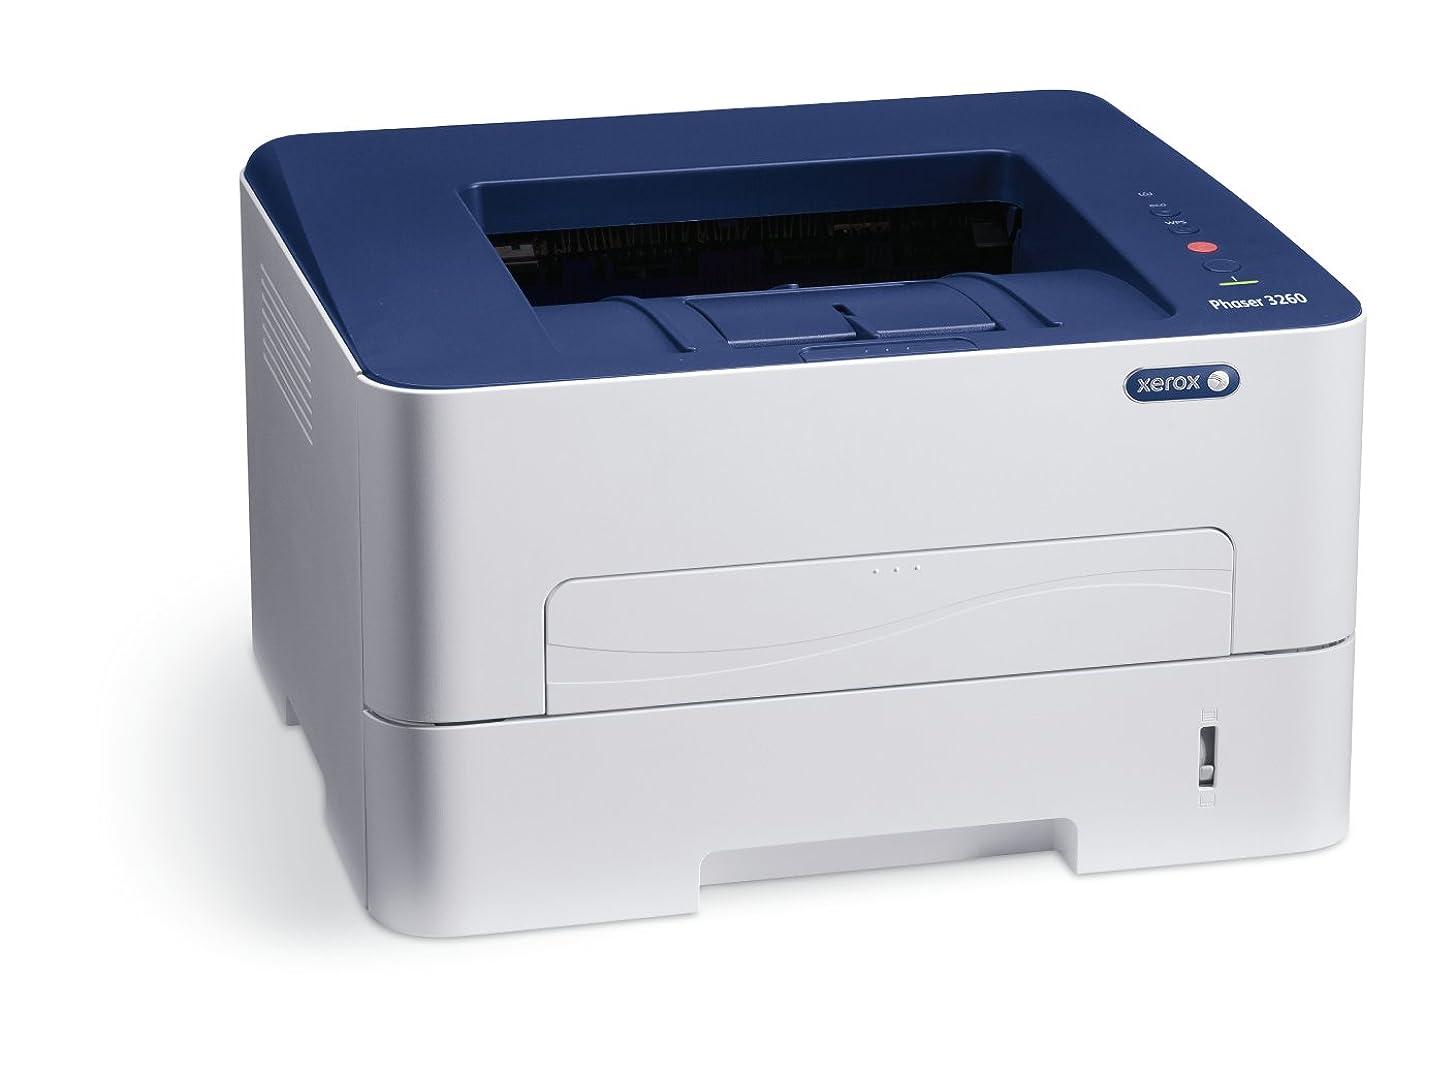 Xerox Phaser 3260/DNI Monchrome Laser Printer - Wireless